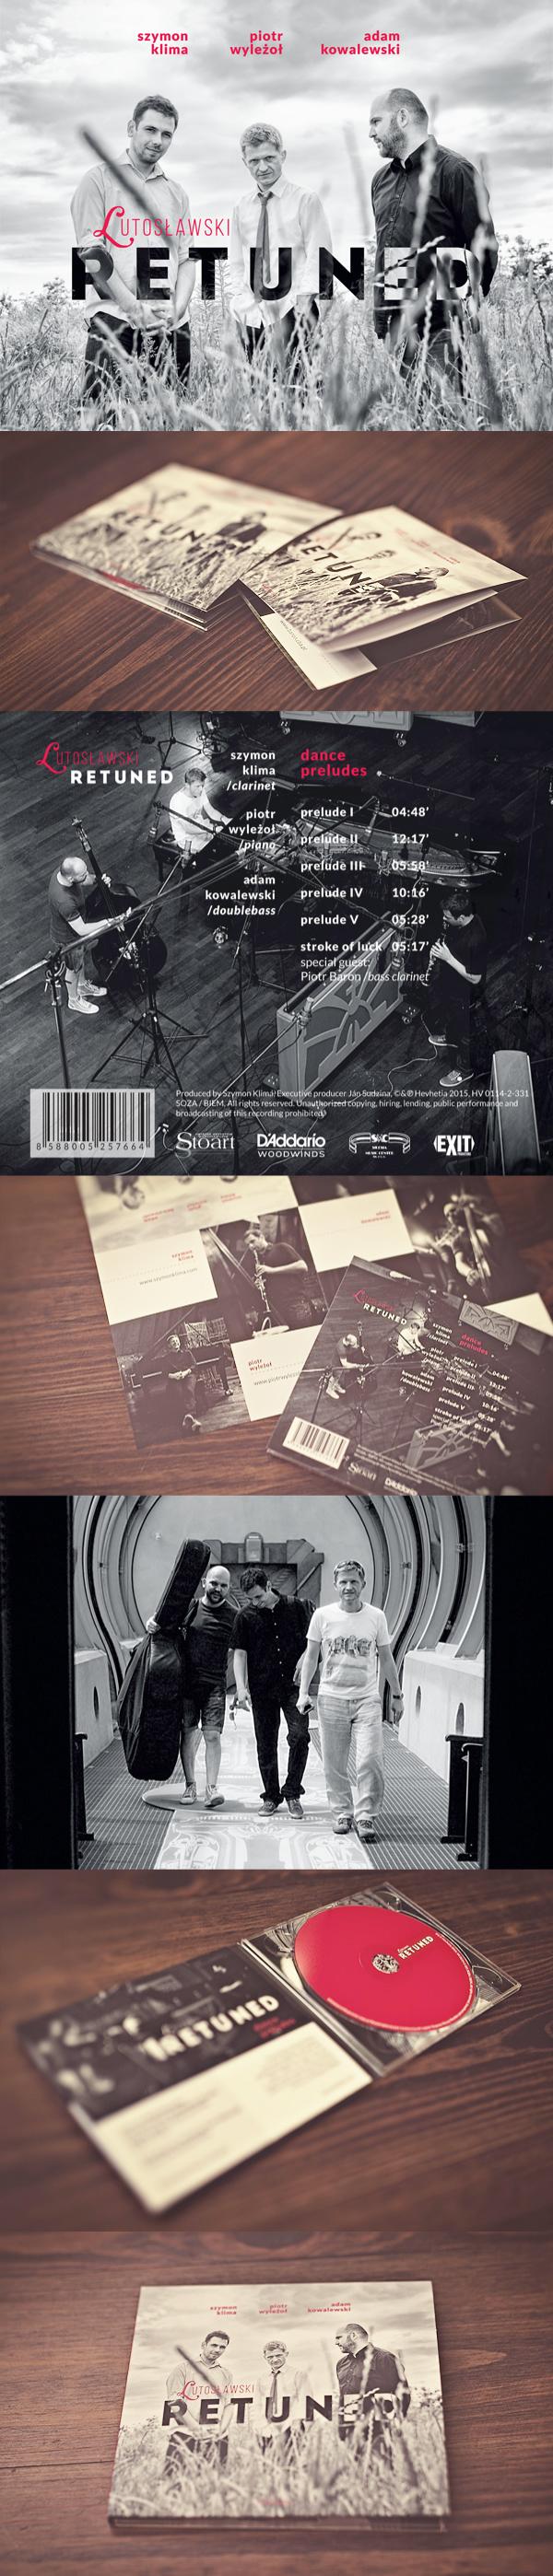 lutoslawski retuned cd packaging katerbel pl